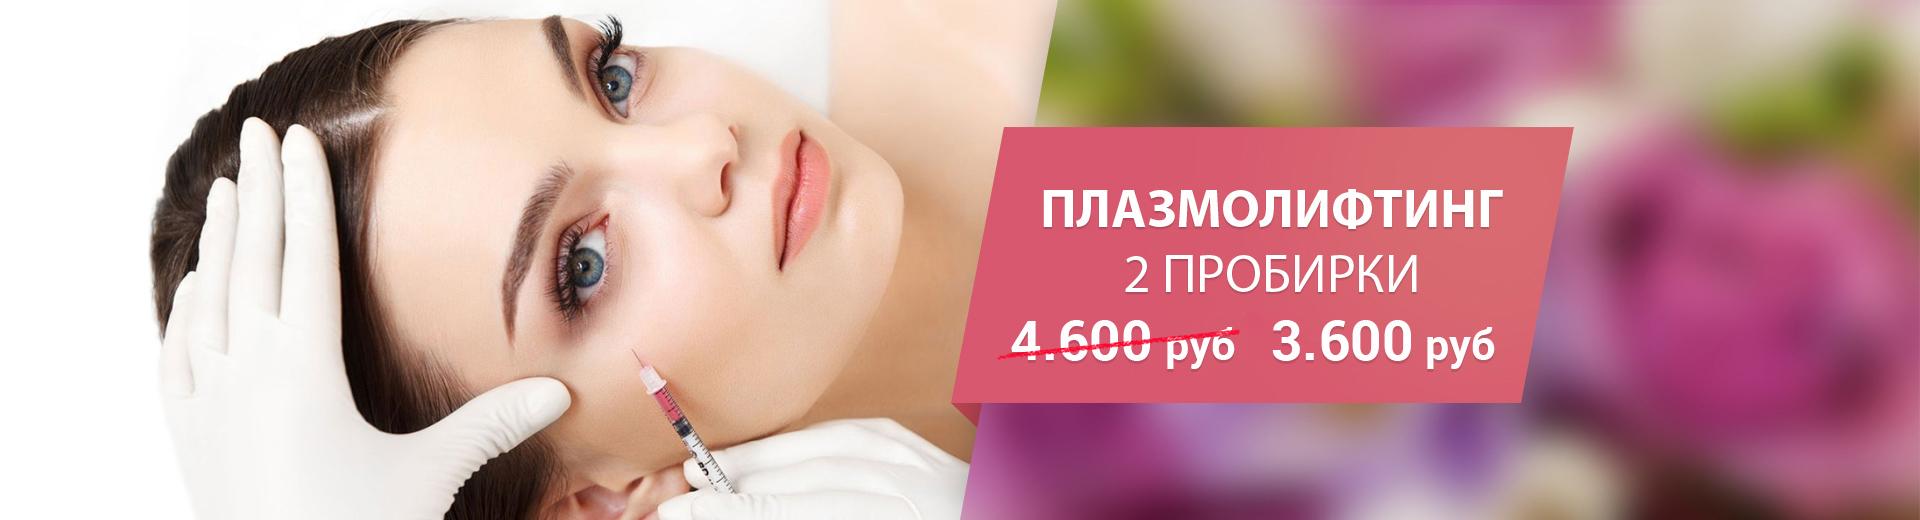 Плазмолифтинг 2 пробирки - 3.000 рублей